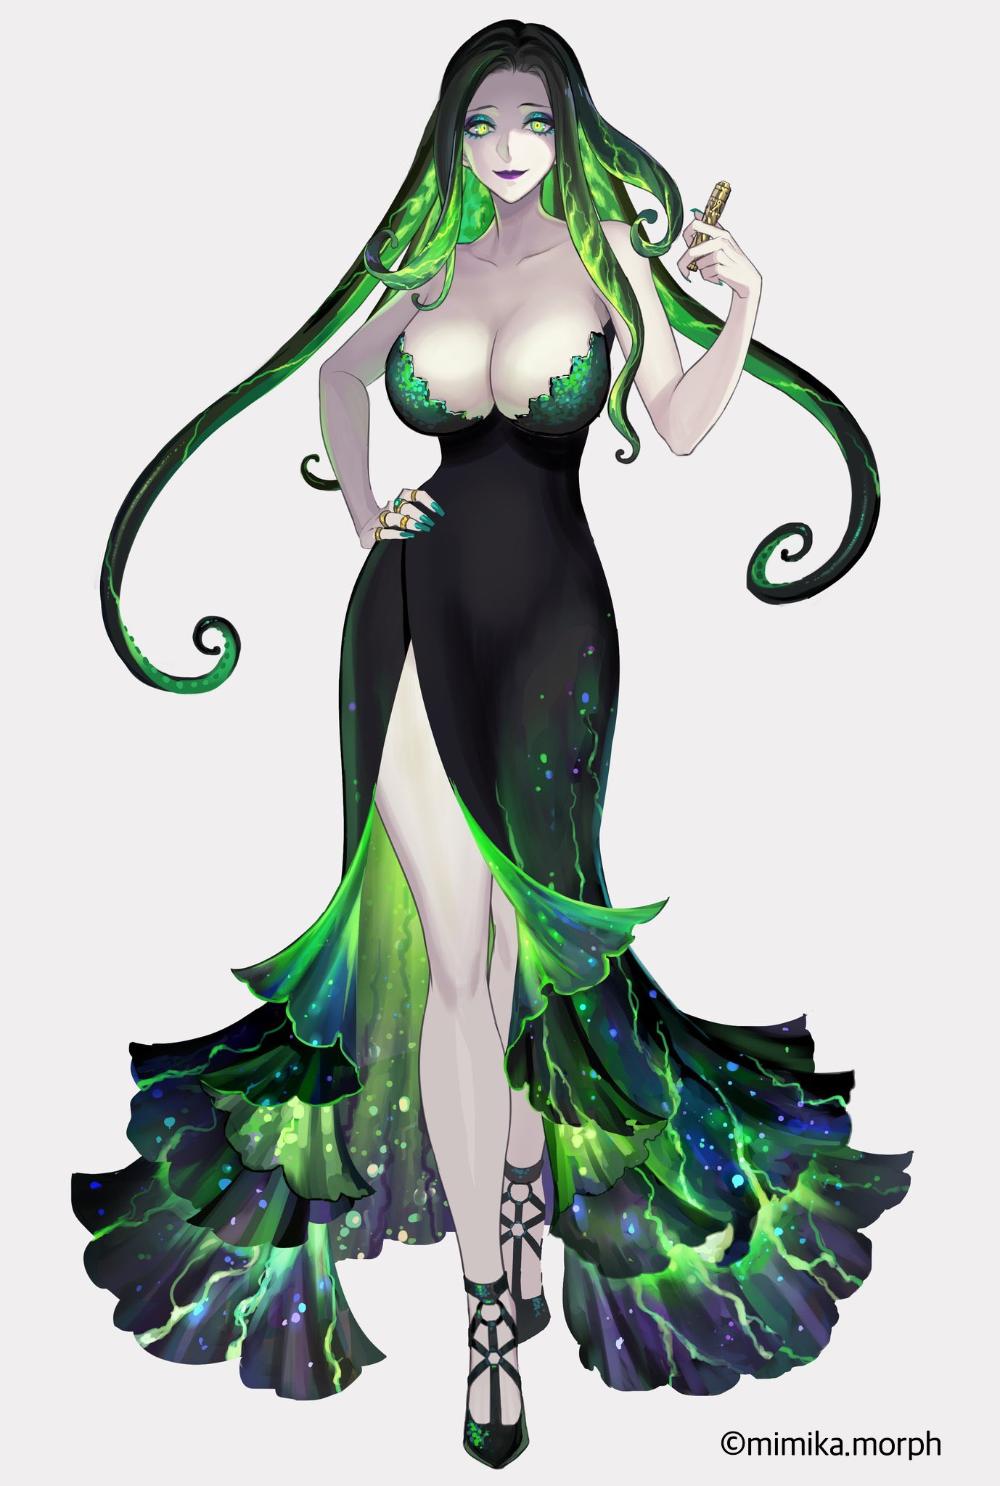 Photo of ミミカ・モーフ?virtual creature on Twitter